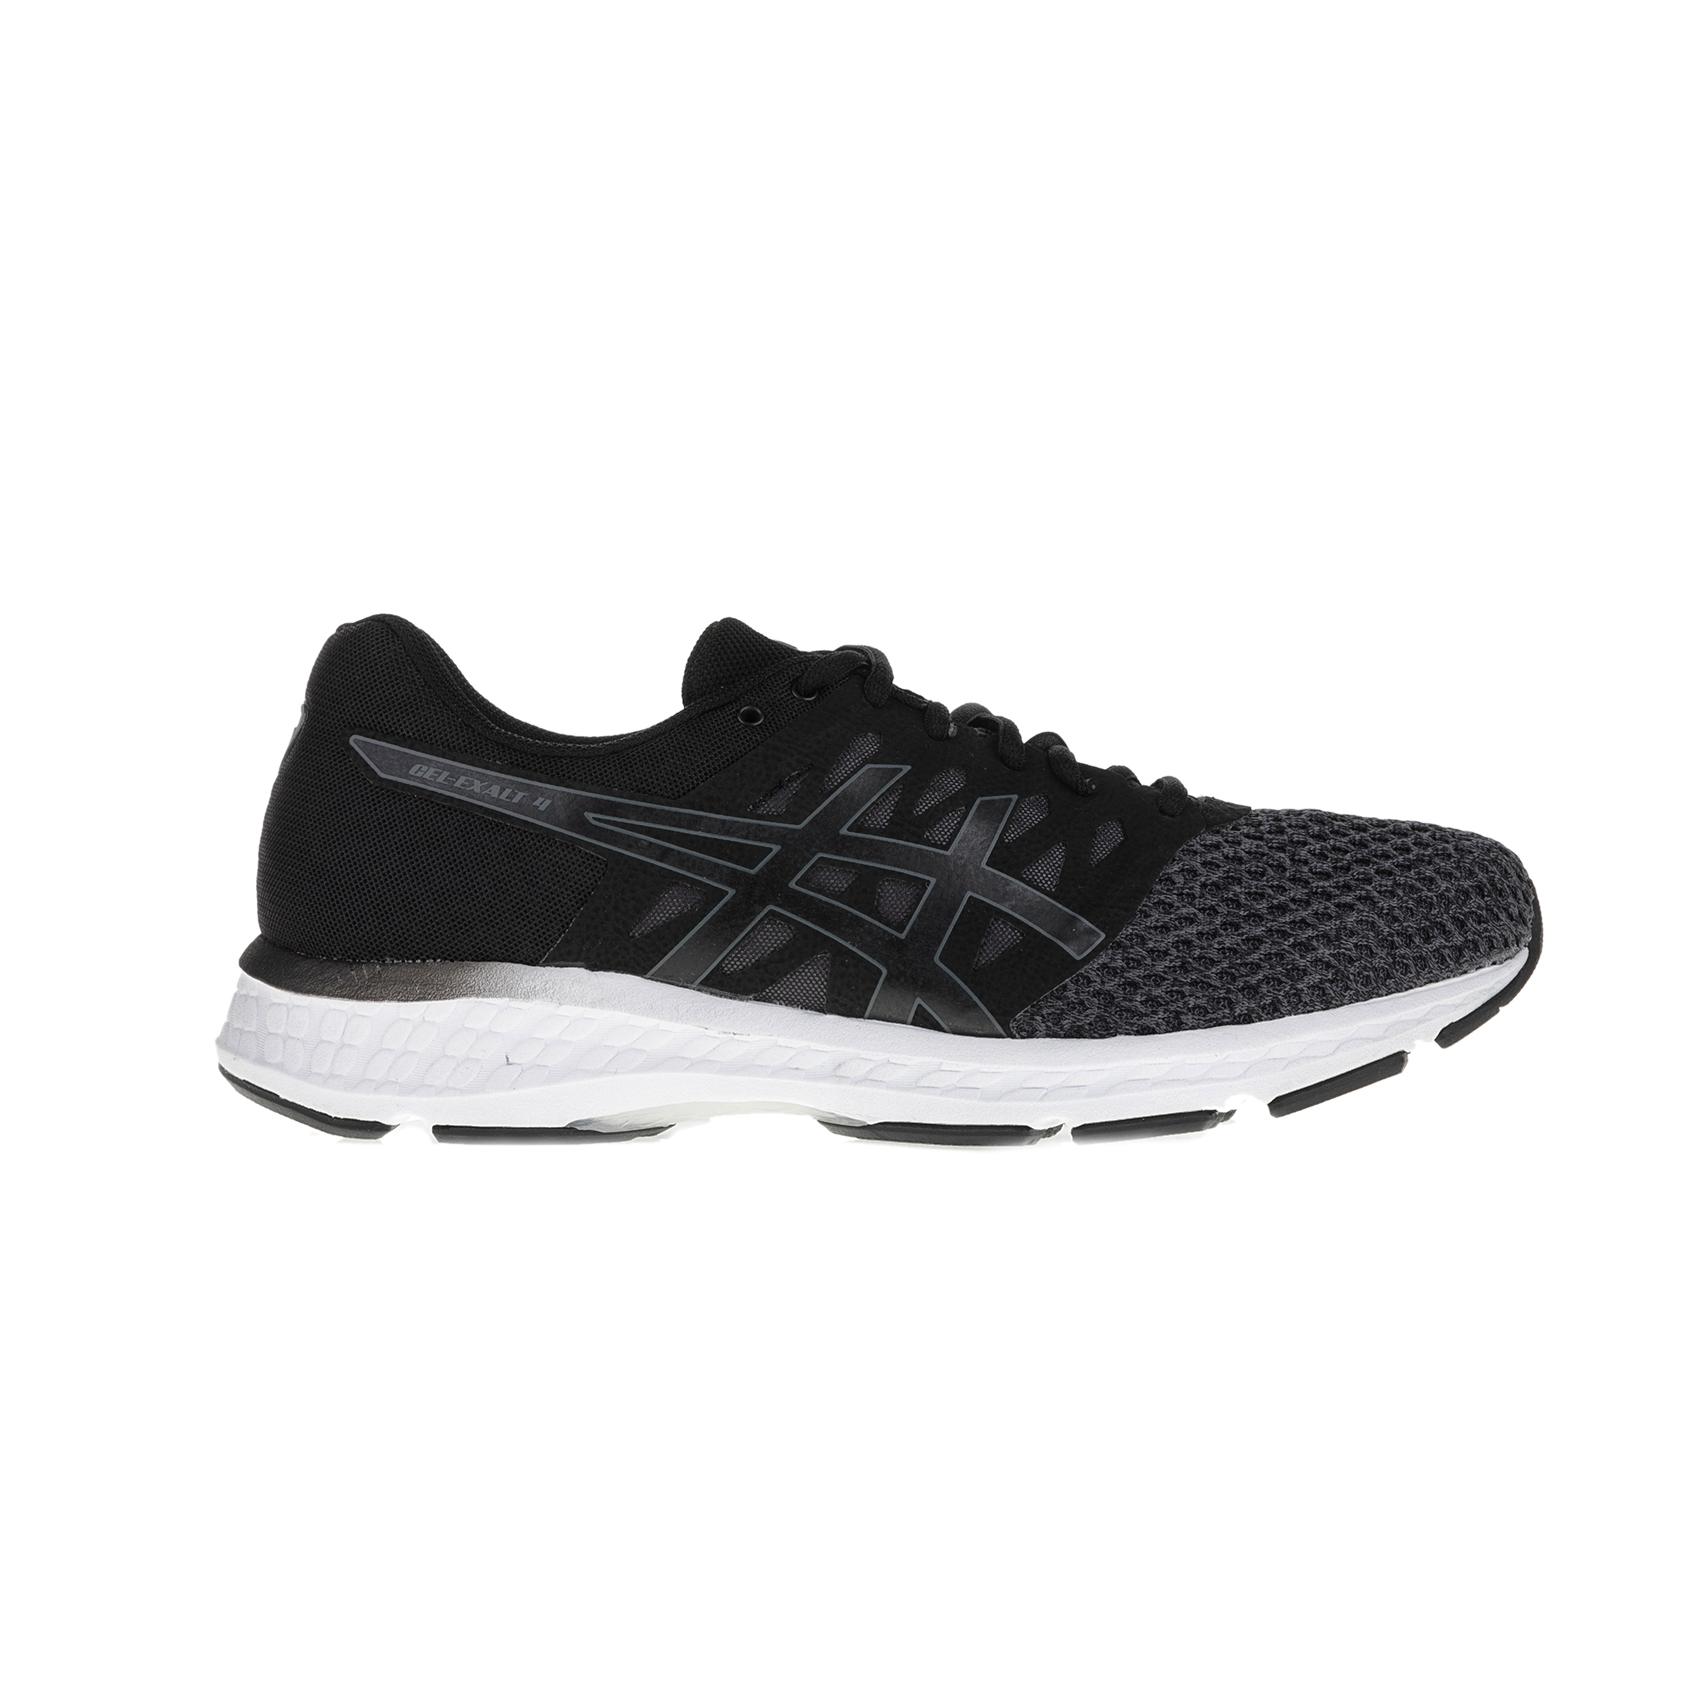 ASICS – Ανδρικά αθλητικά παπούτσια ASICS GEL-EXALT 4 μαύρα-γκρι